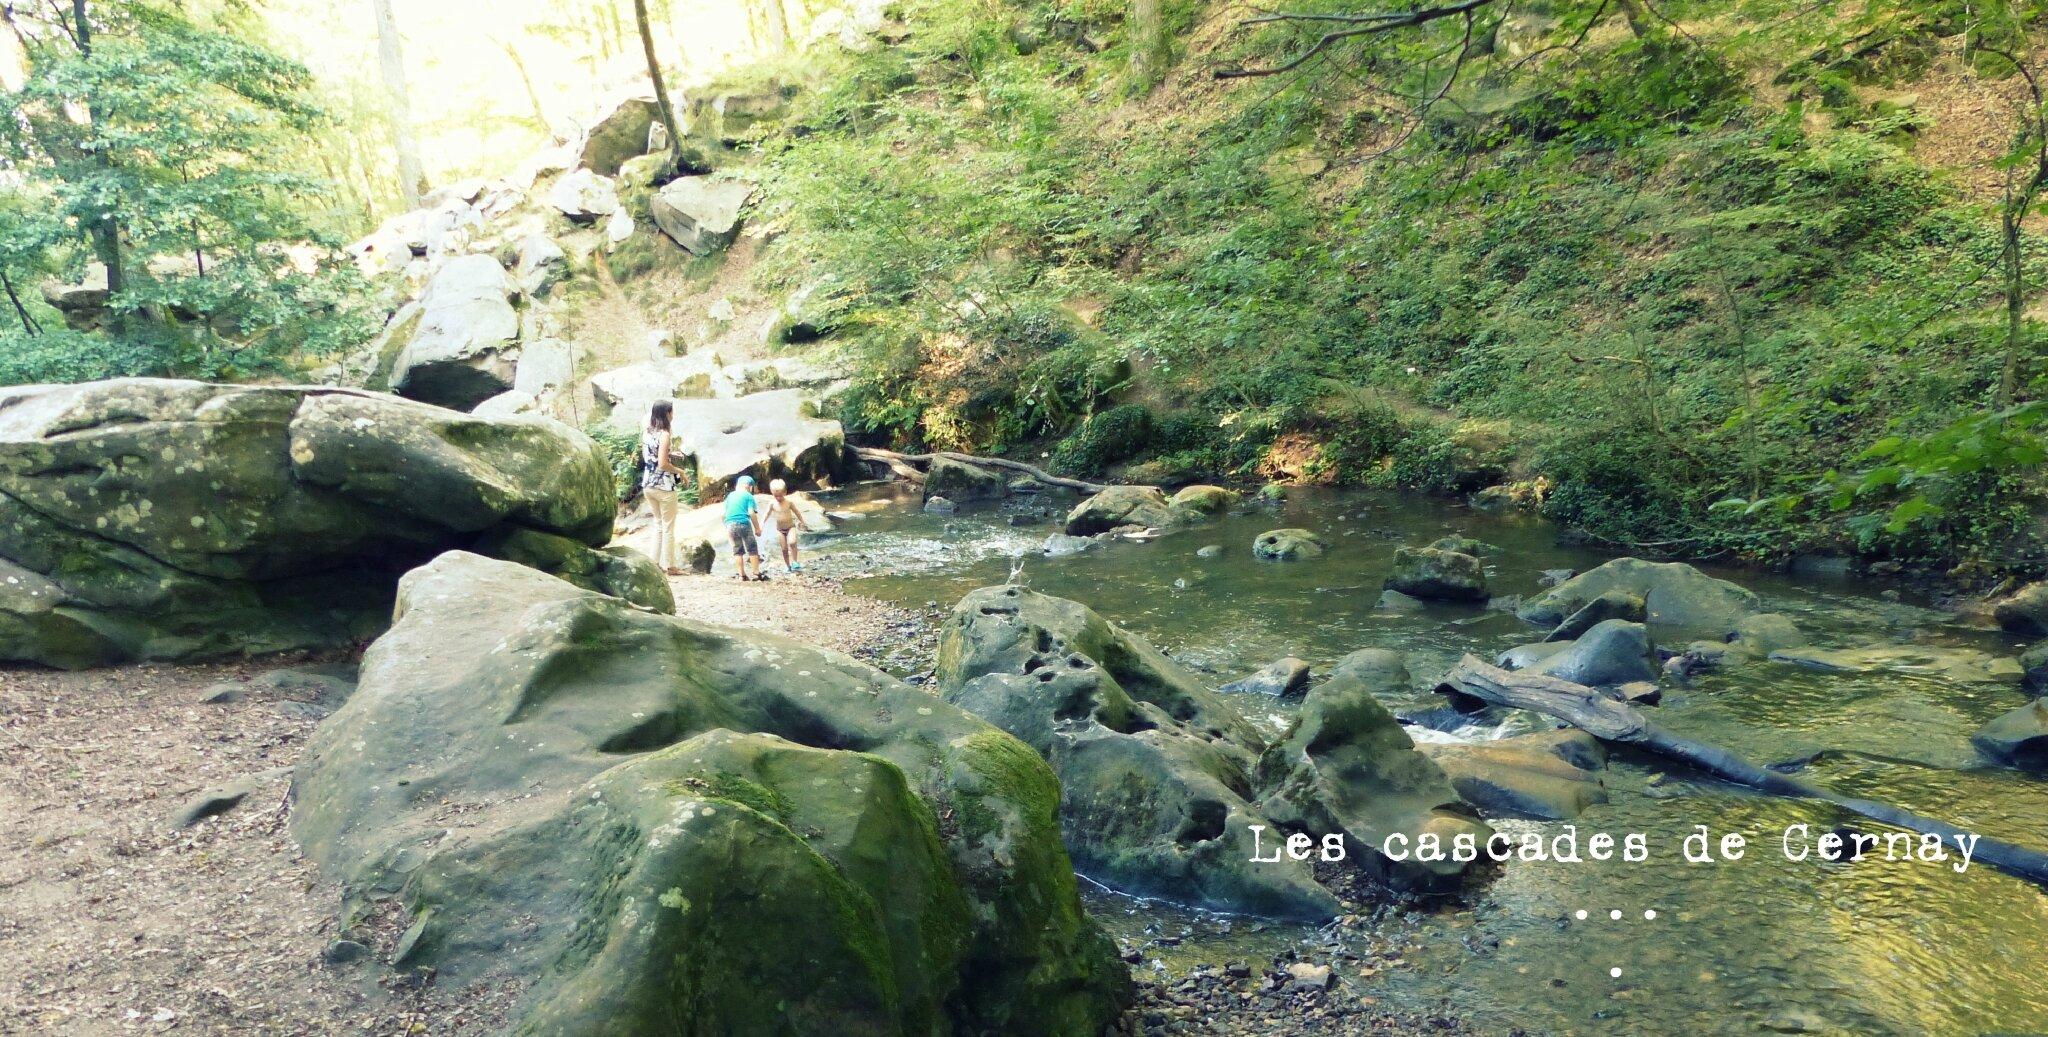 Les cascades de Cernay